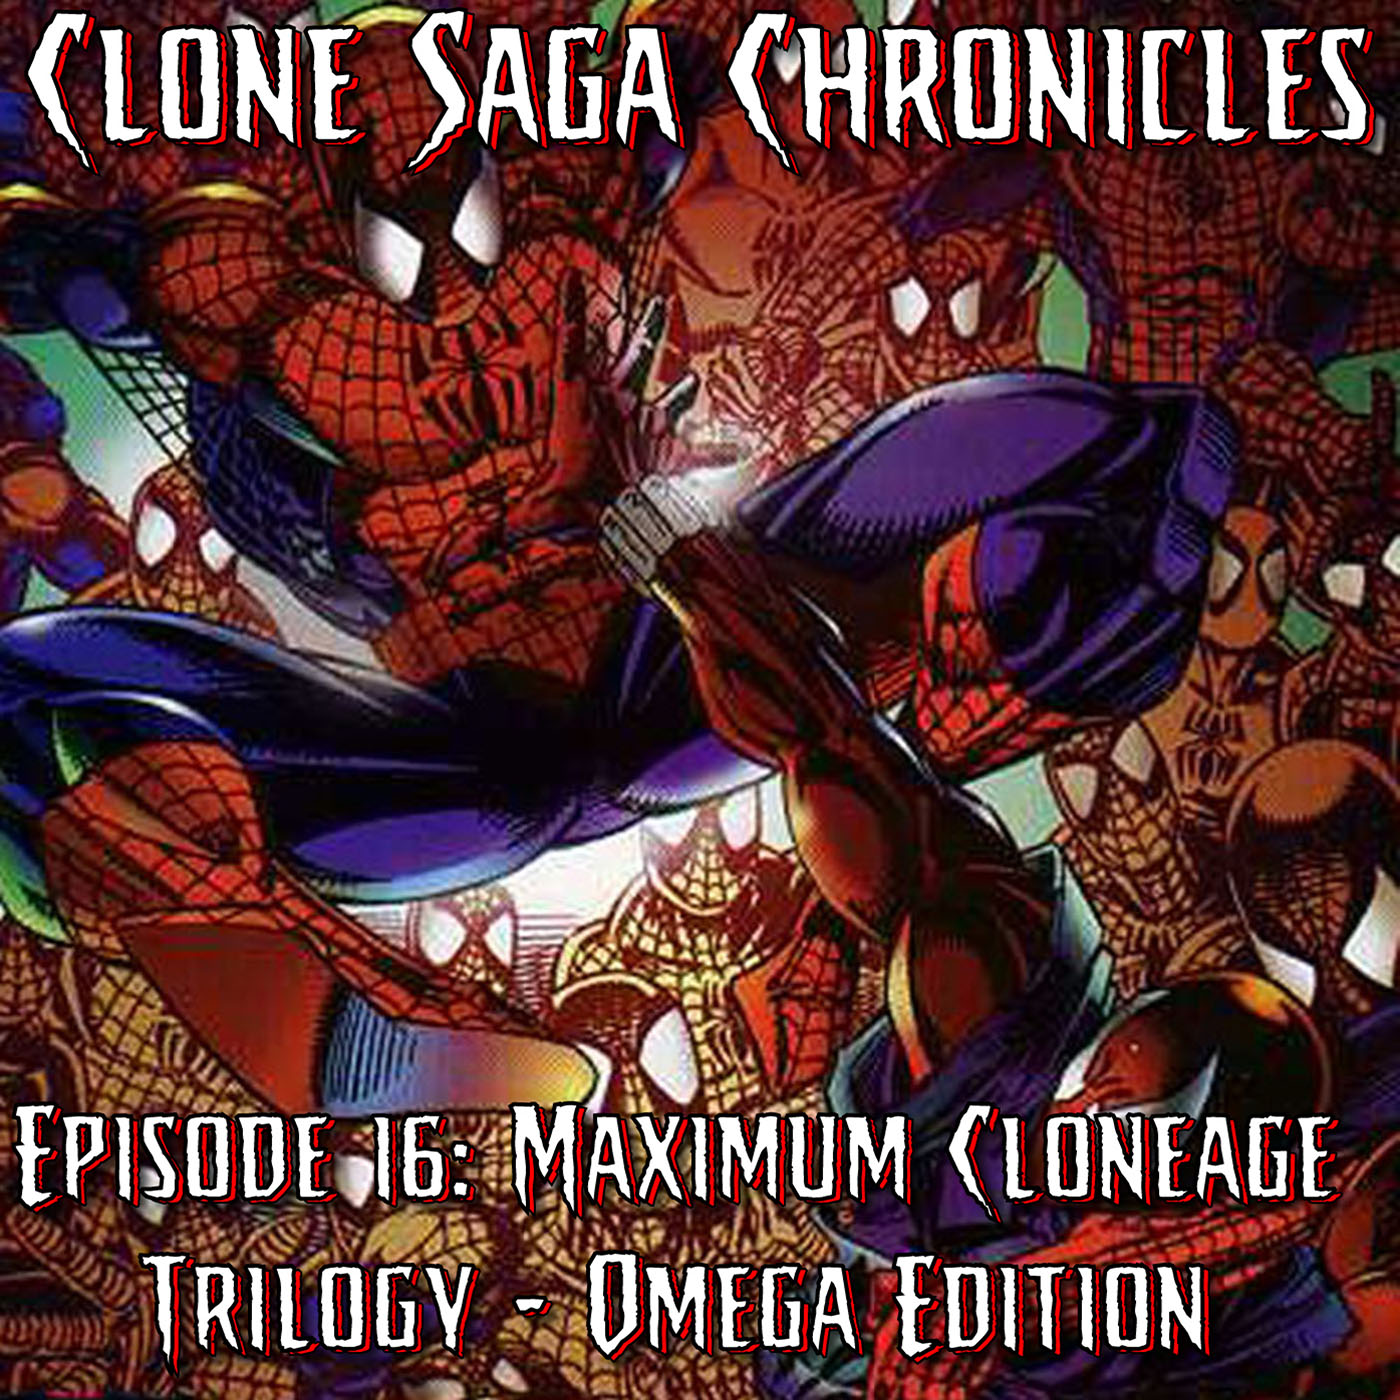 CSC Episode 16: Maximum Clonage Trilogy-Omega Edition (August 1995)